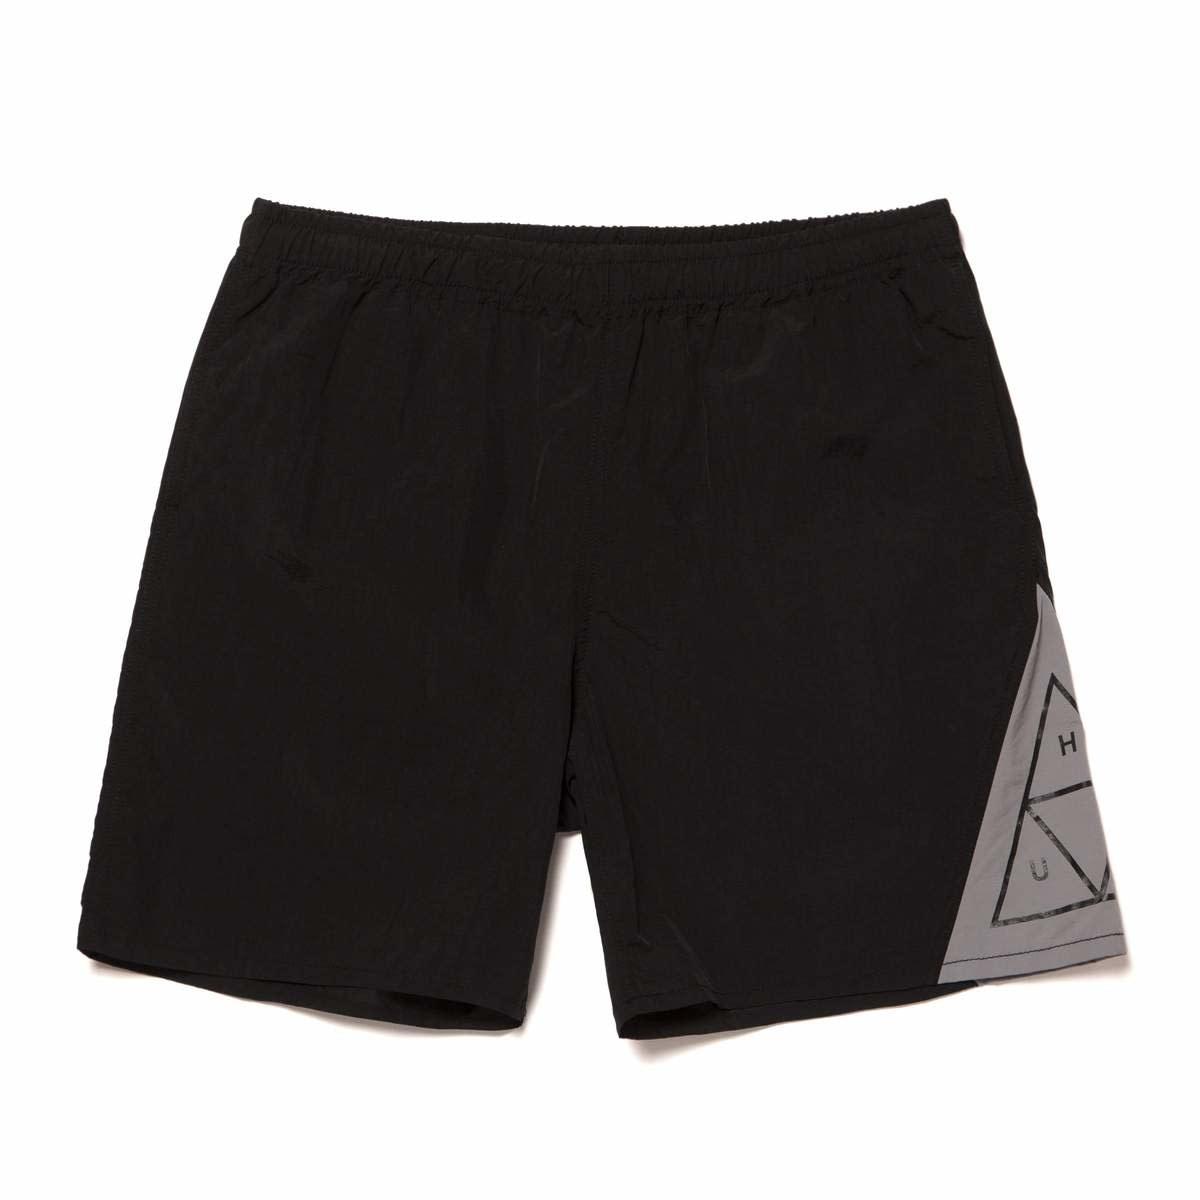 HUF TT Hybrid Short Black